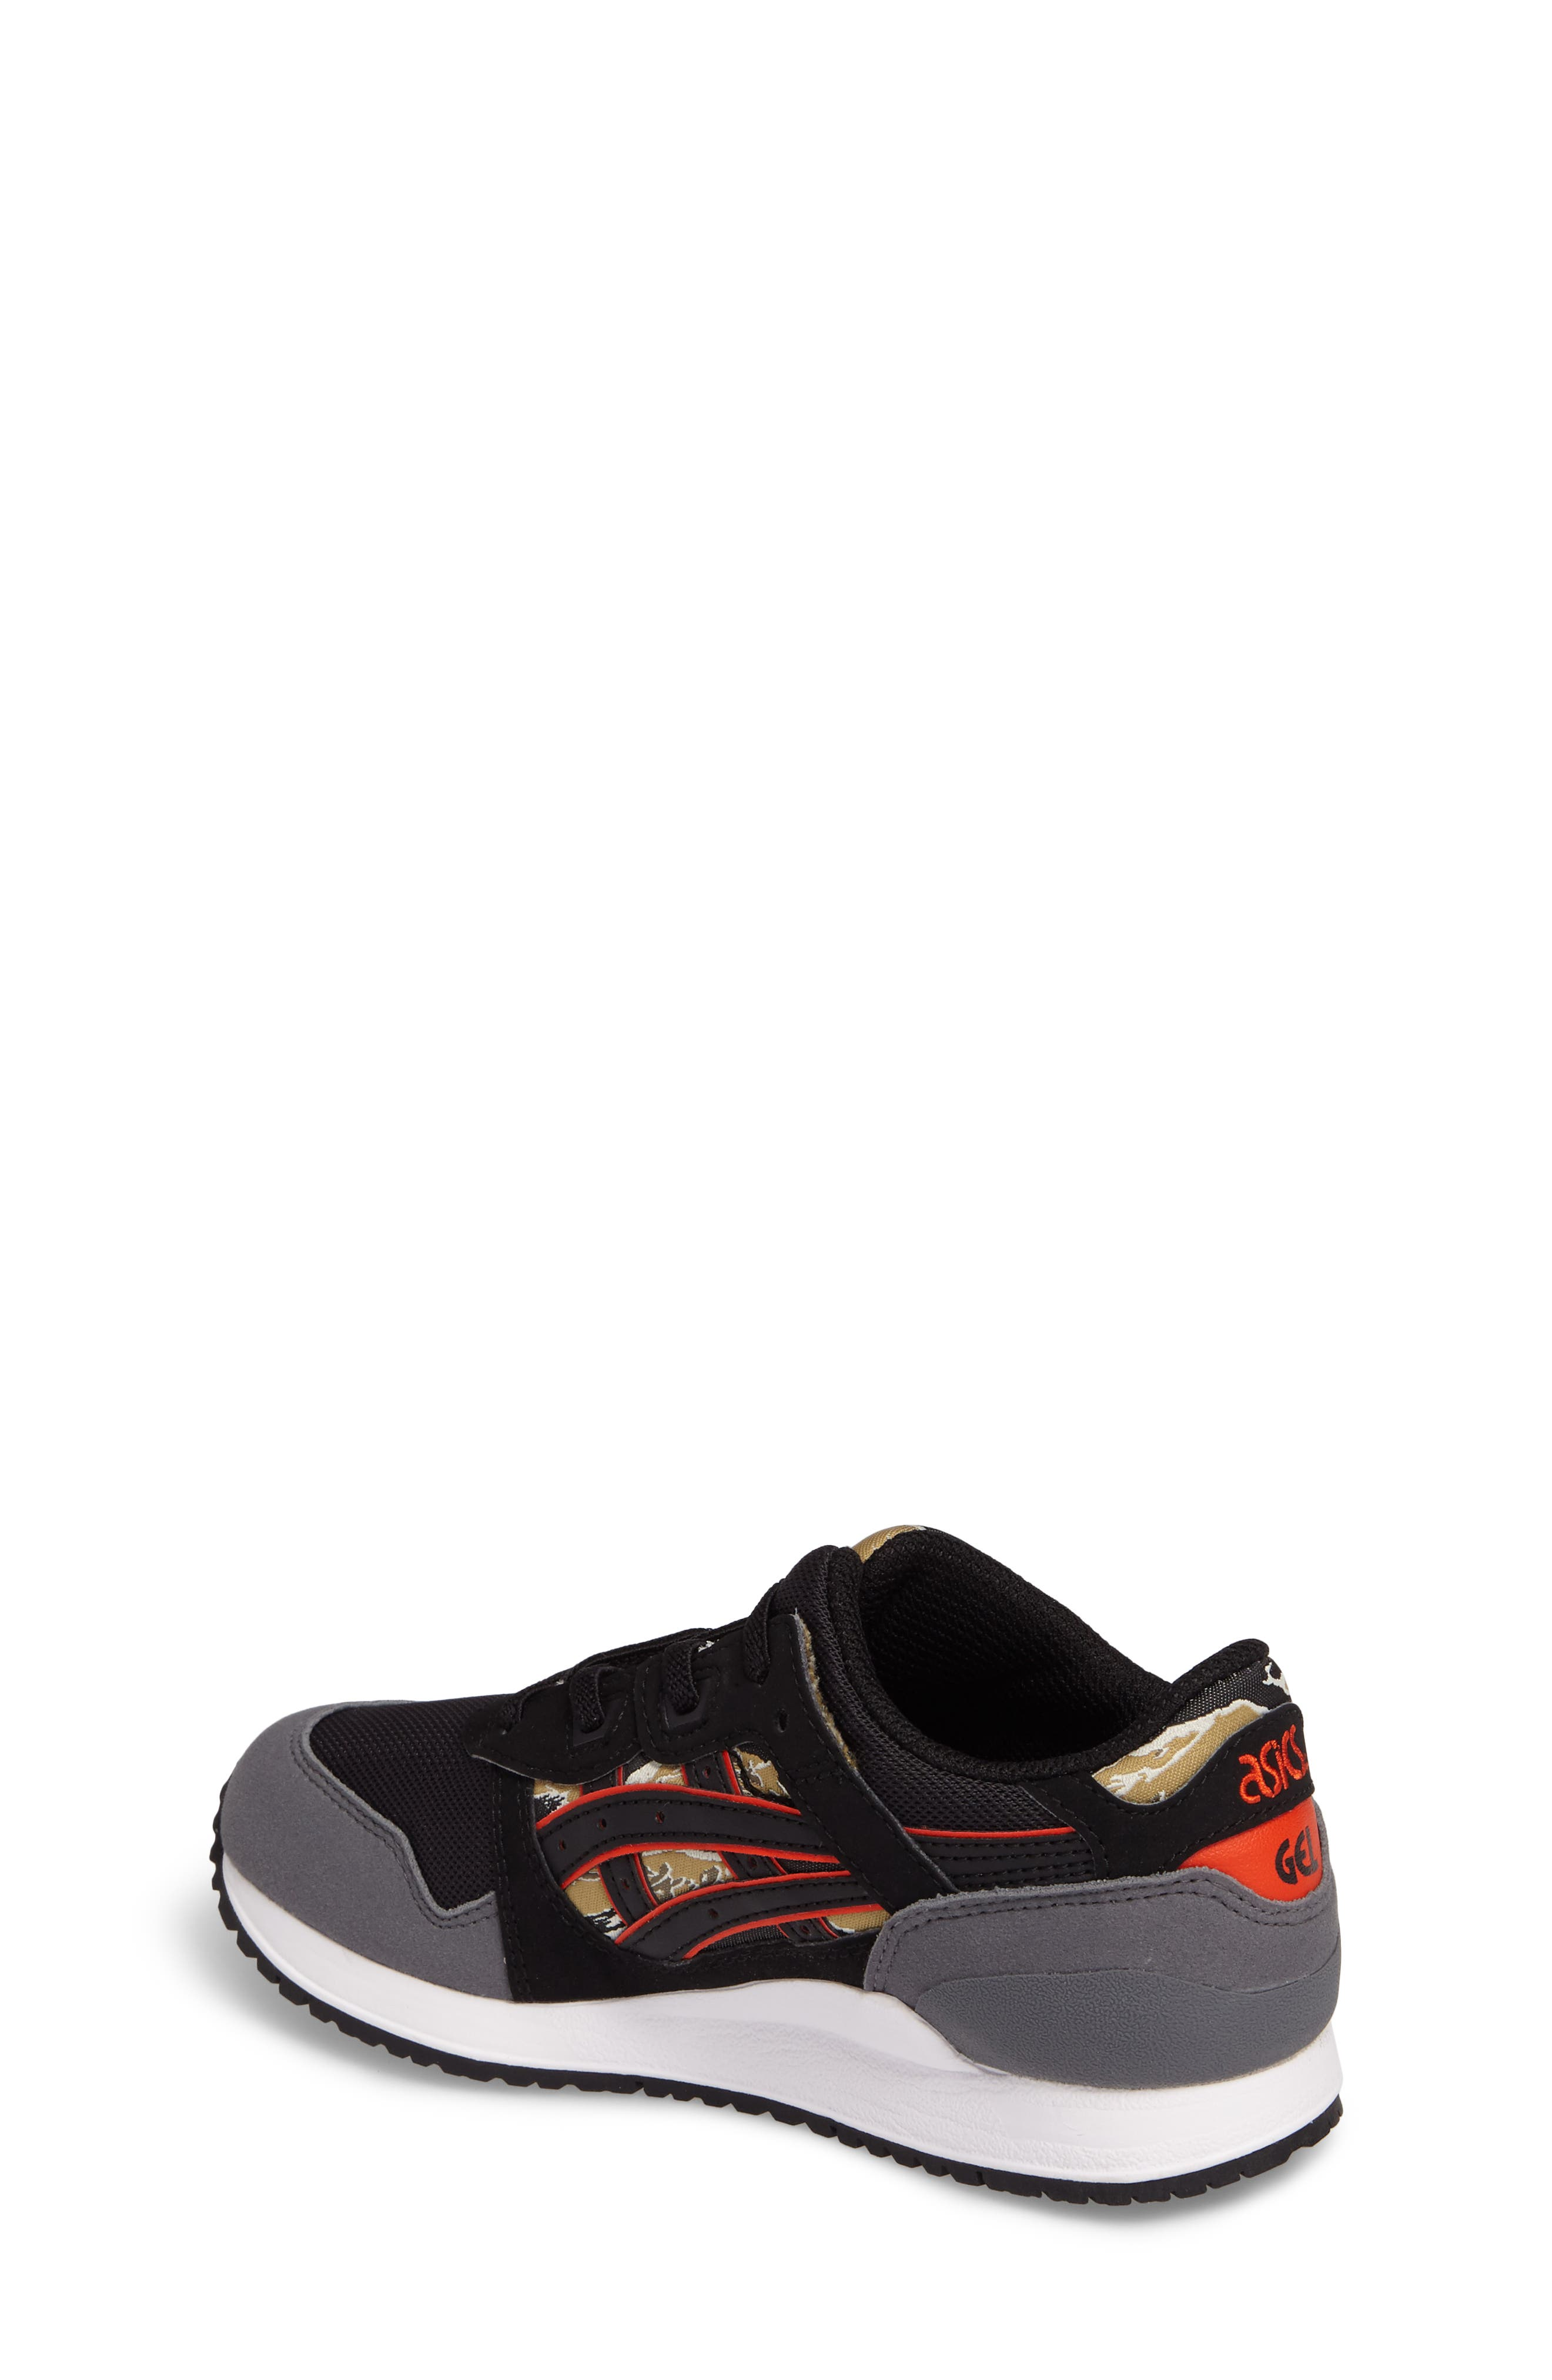 GEL-LYTE<sup>®</sup> III PS Slip-On Sneaker,                             Alternate thumbnail 2, color,                             001